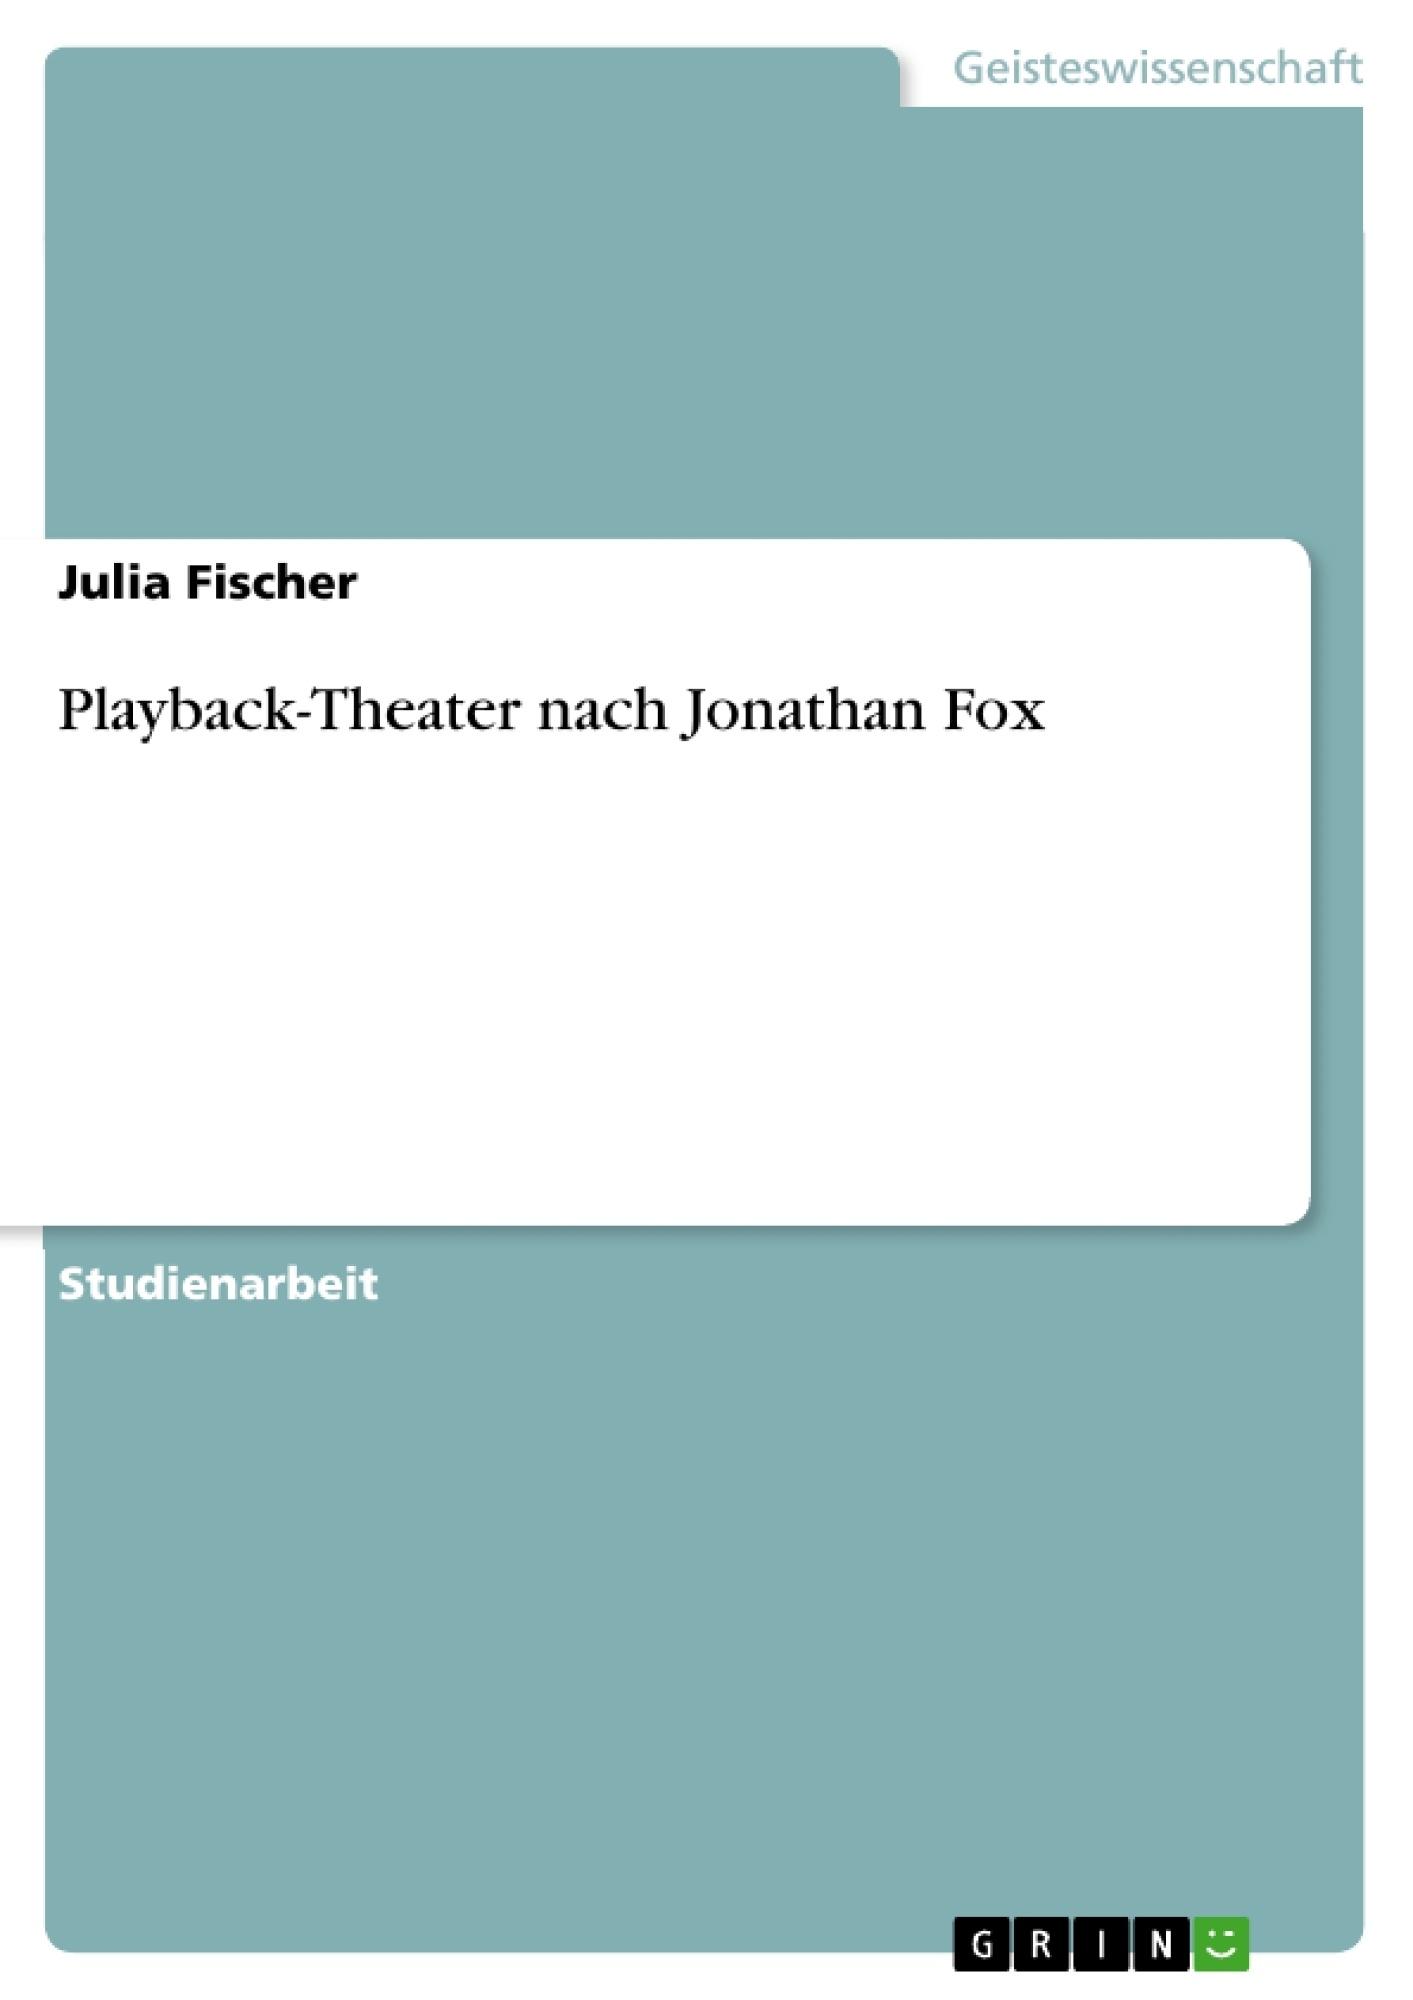 Titel: Playback-Theater nach Jonathan Fox